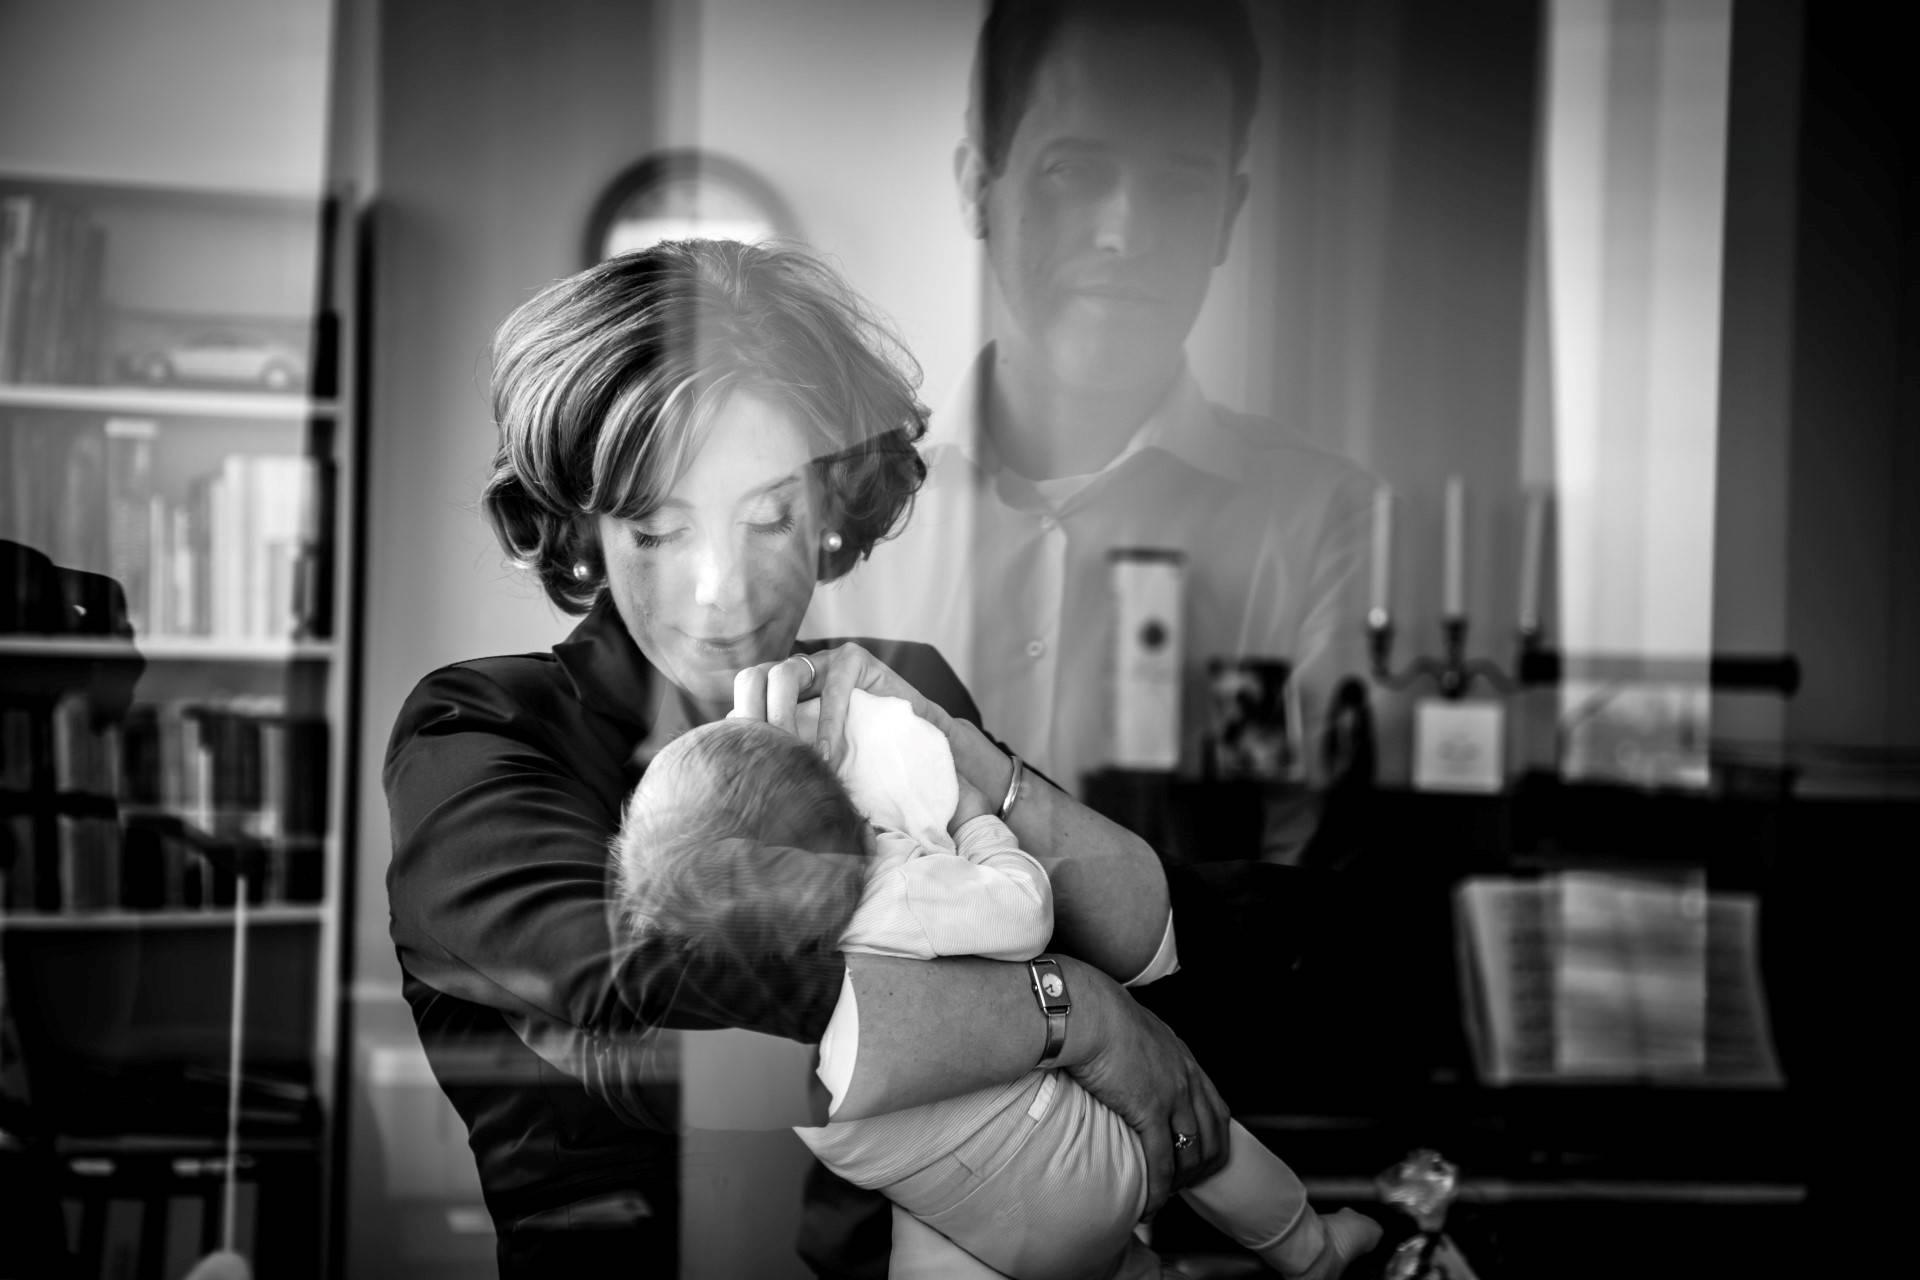 Bedrijfsfotografie, portret, evenement fotografie, trouwreportages, familiereportages, newborn fotografie